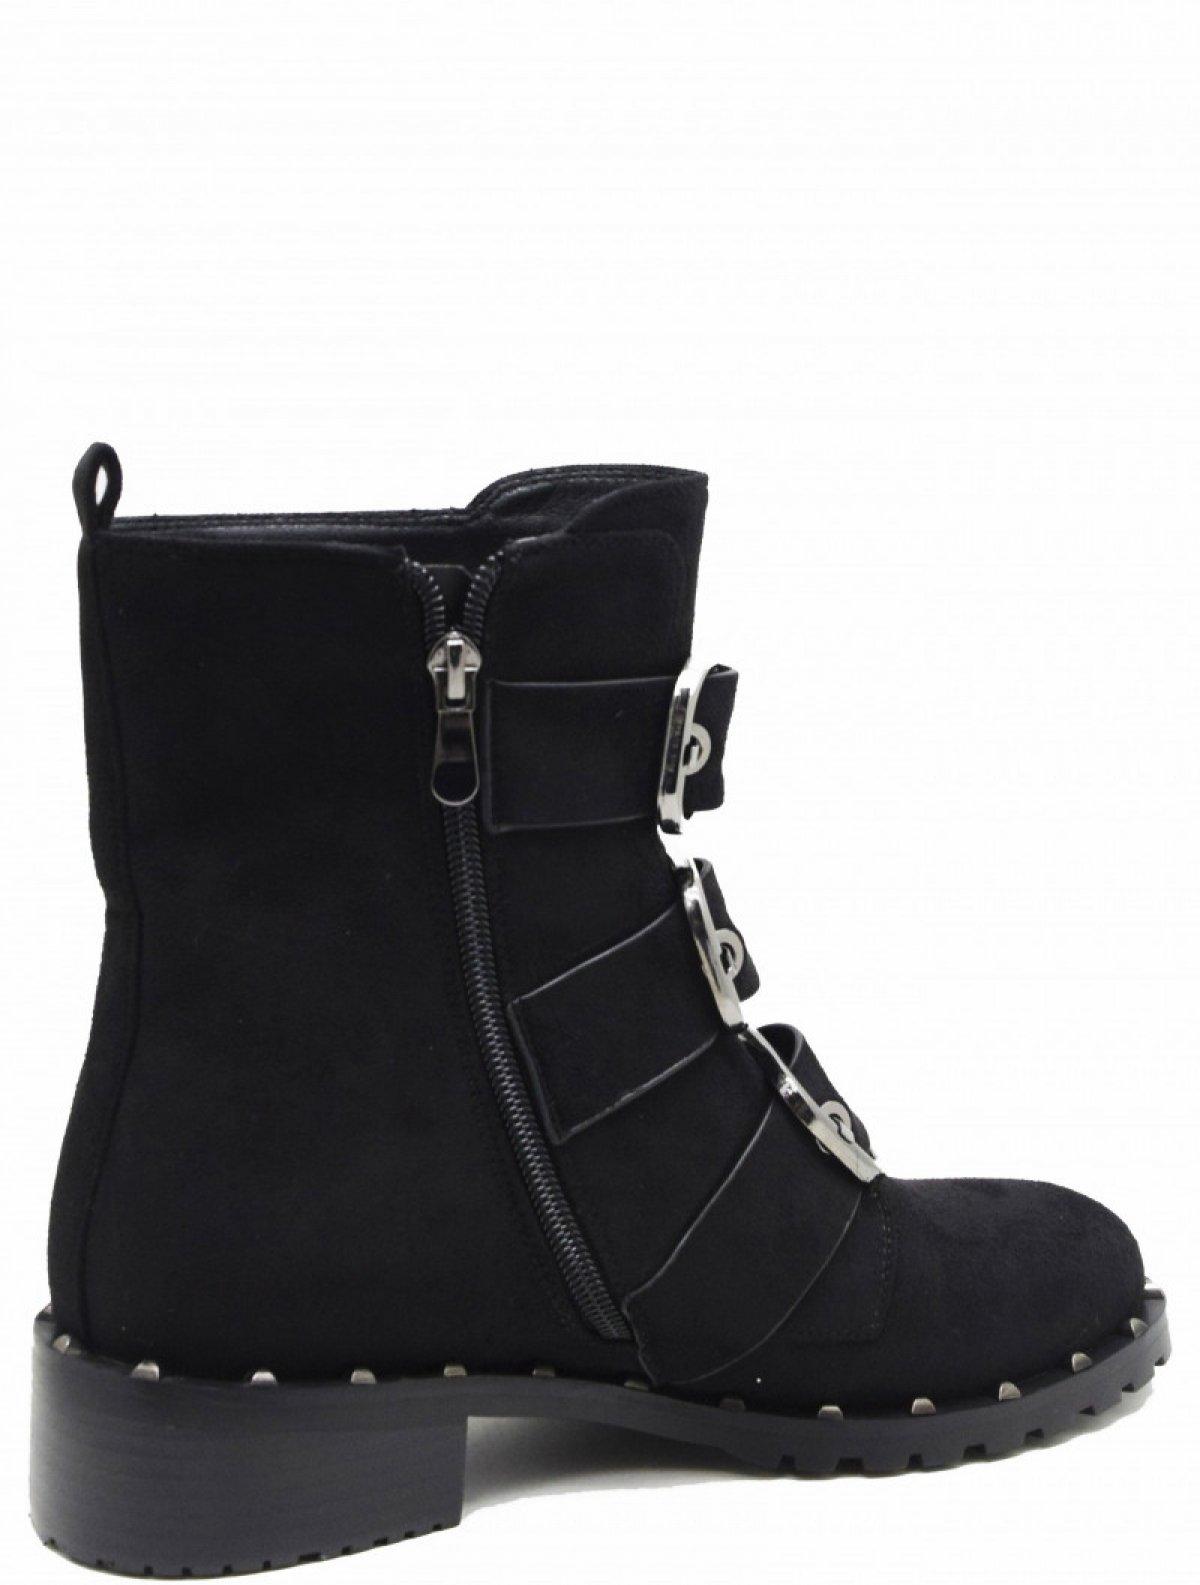 Admlis 8268 женские ботинки